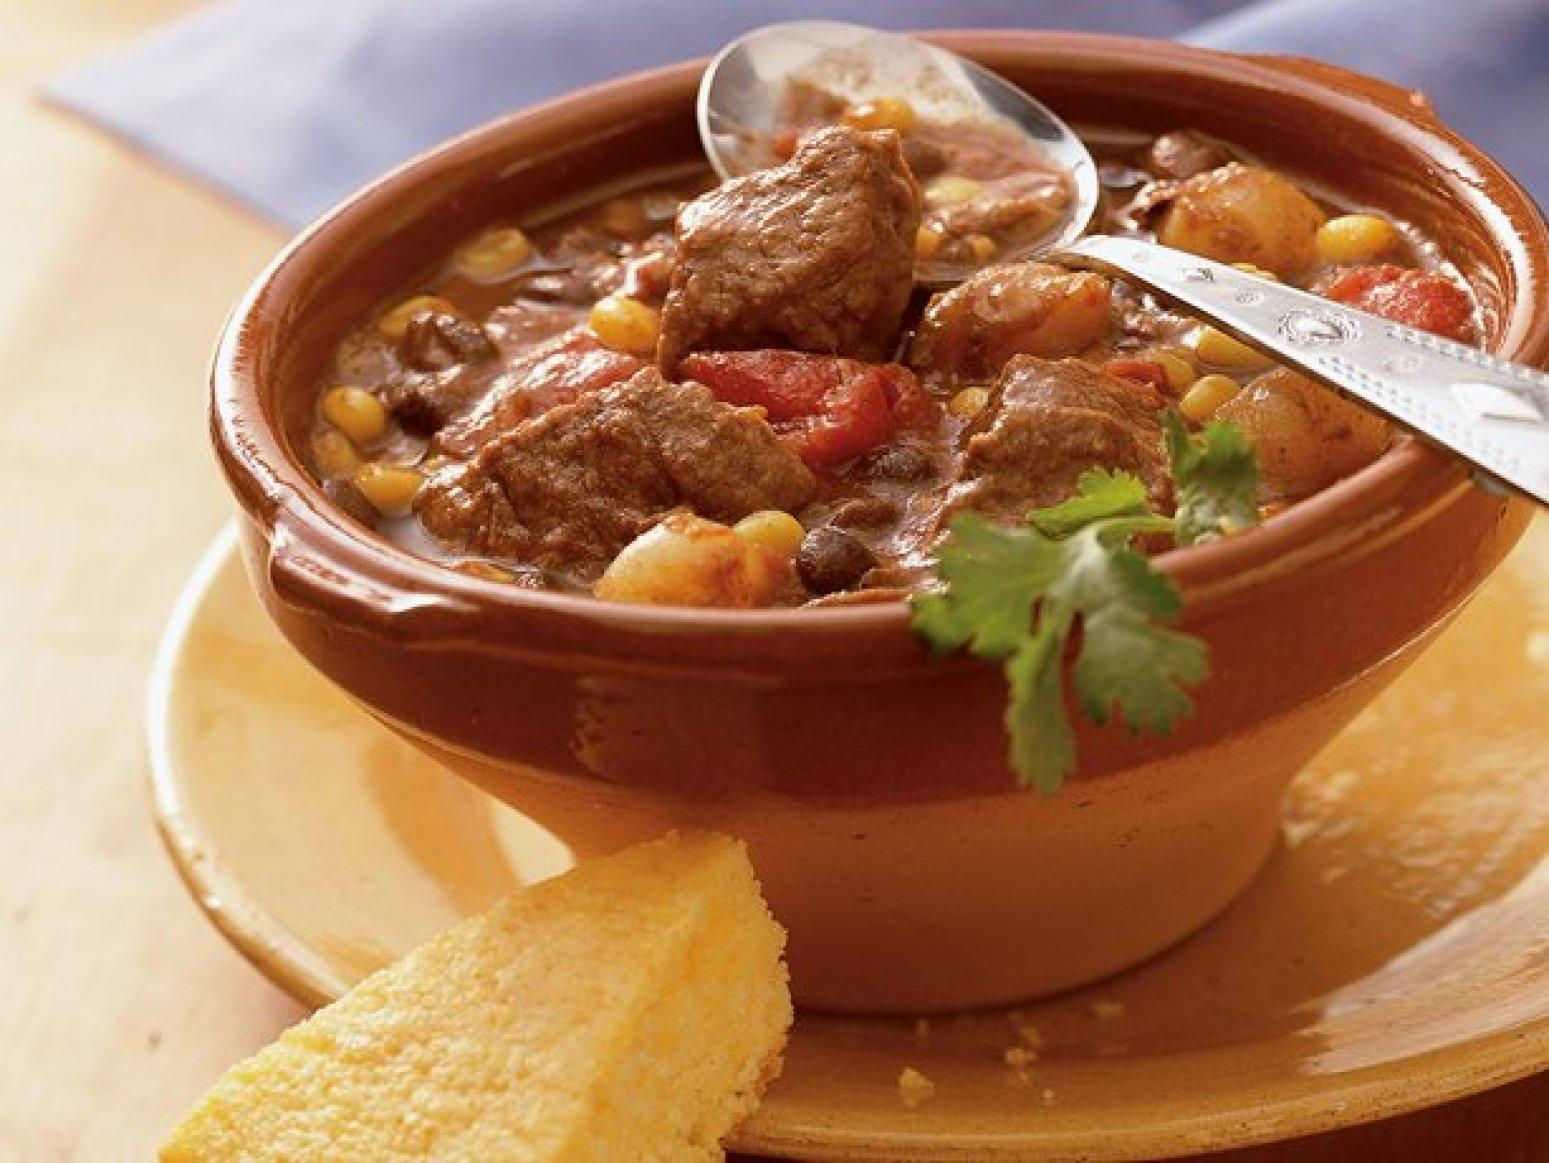 Betty crocker old fashioned beef stew 8